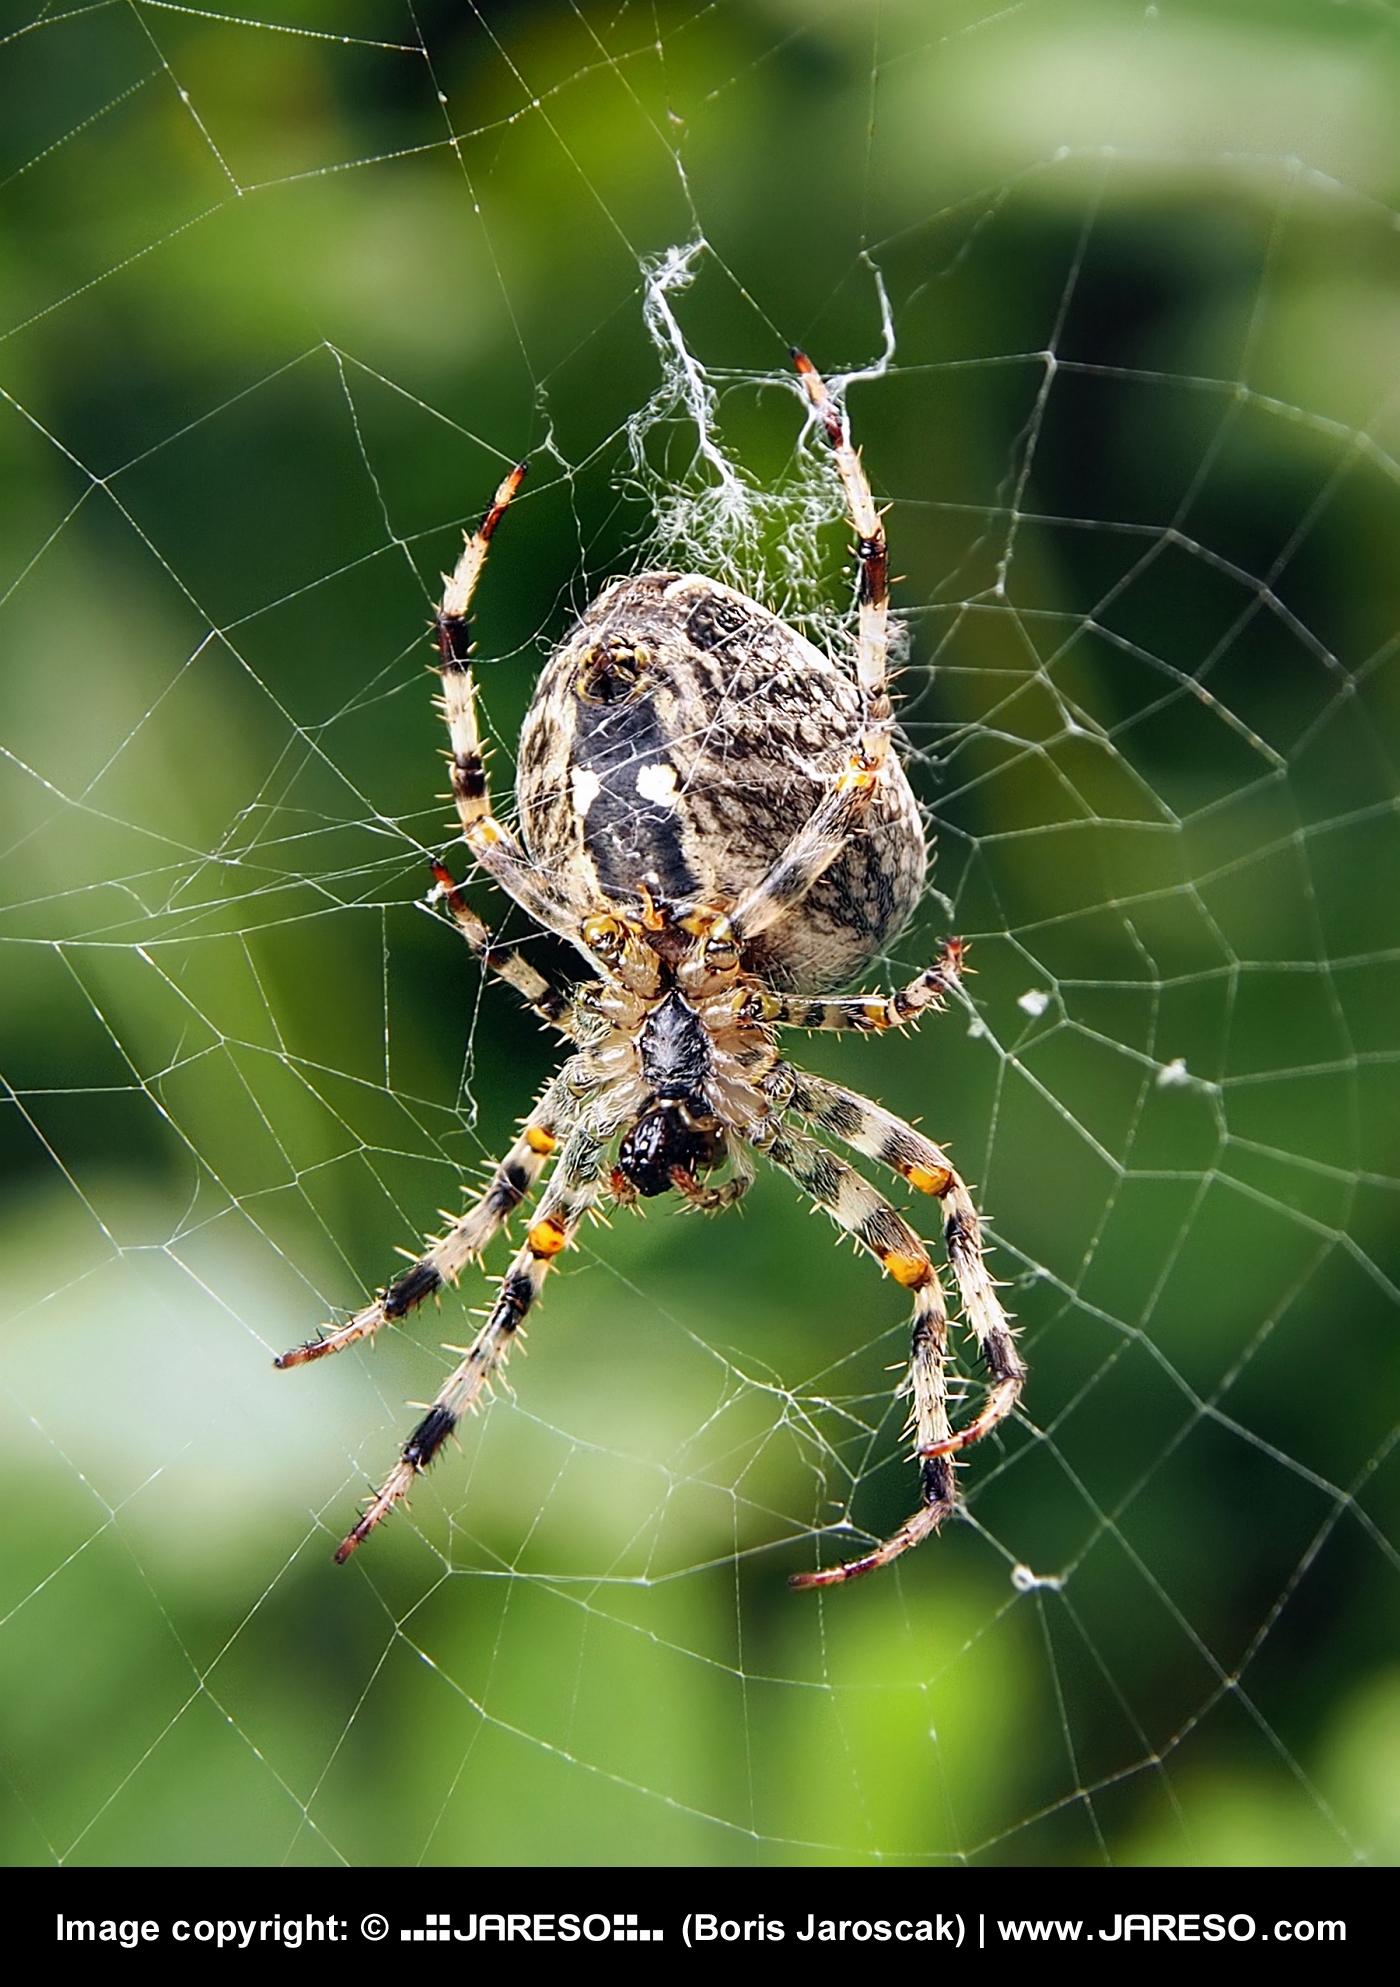 web_gplus_fb_insect_spider_net_green_summer_p9070165xp9070166_3.jpg